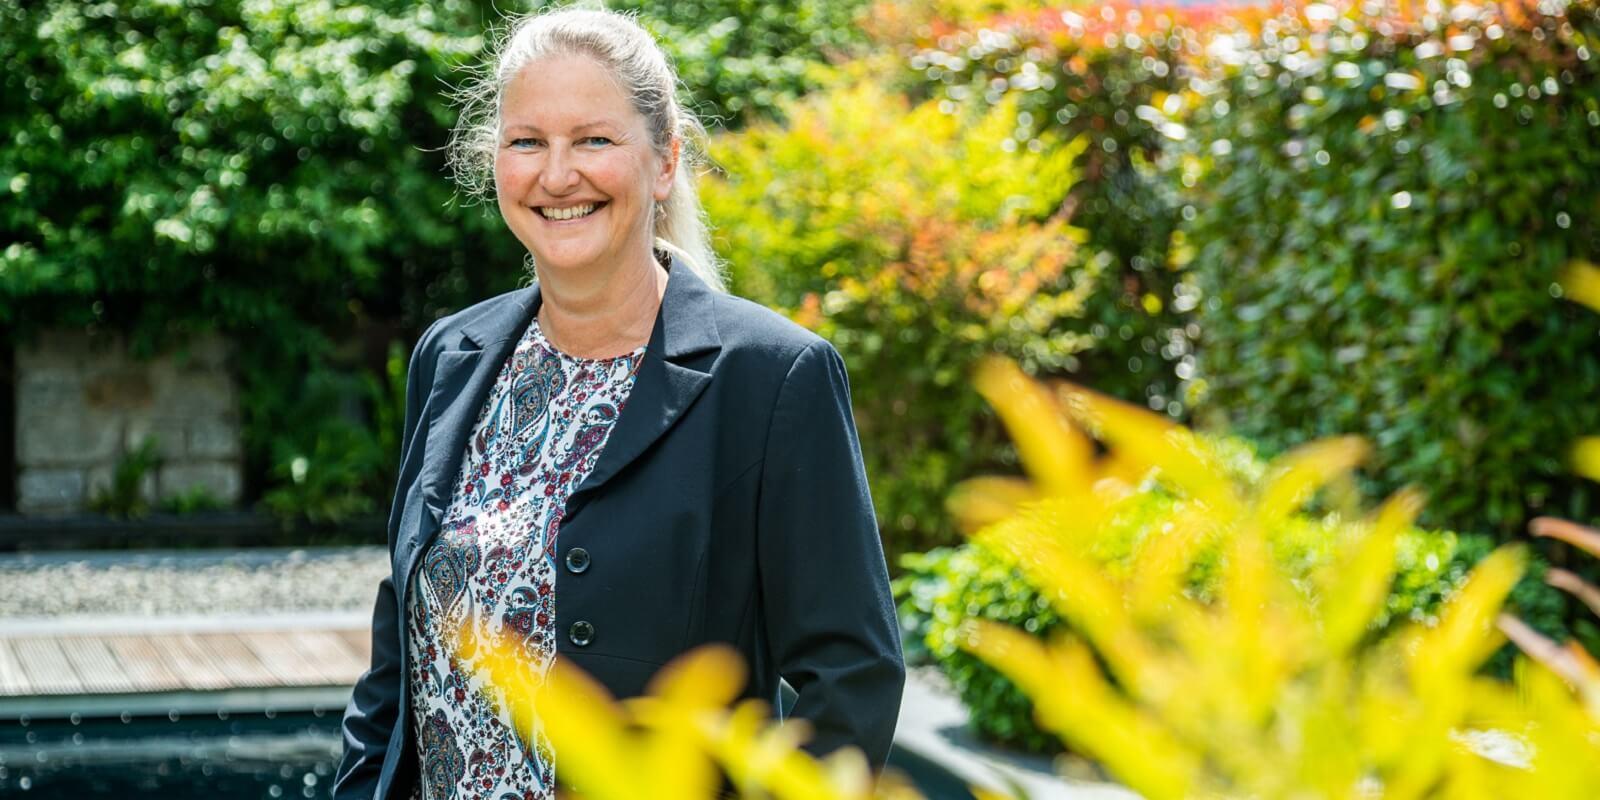 Positiv abheben Sandra Gertzen Unternehmensberatung Personalgewinnung 2021 1600 1200